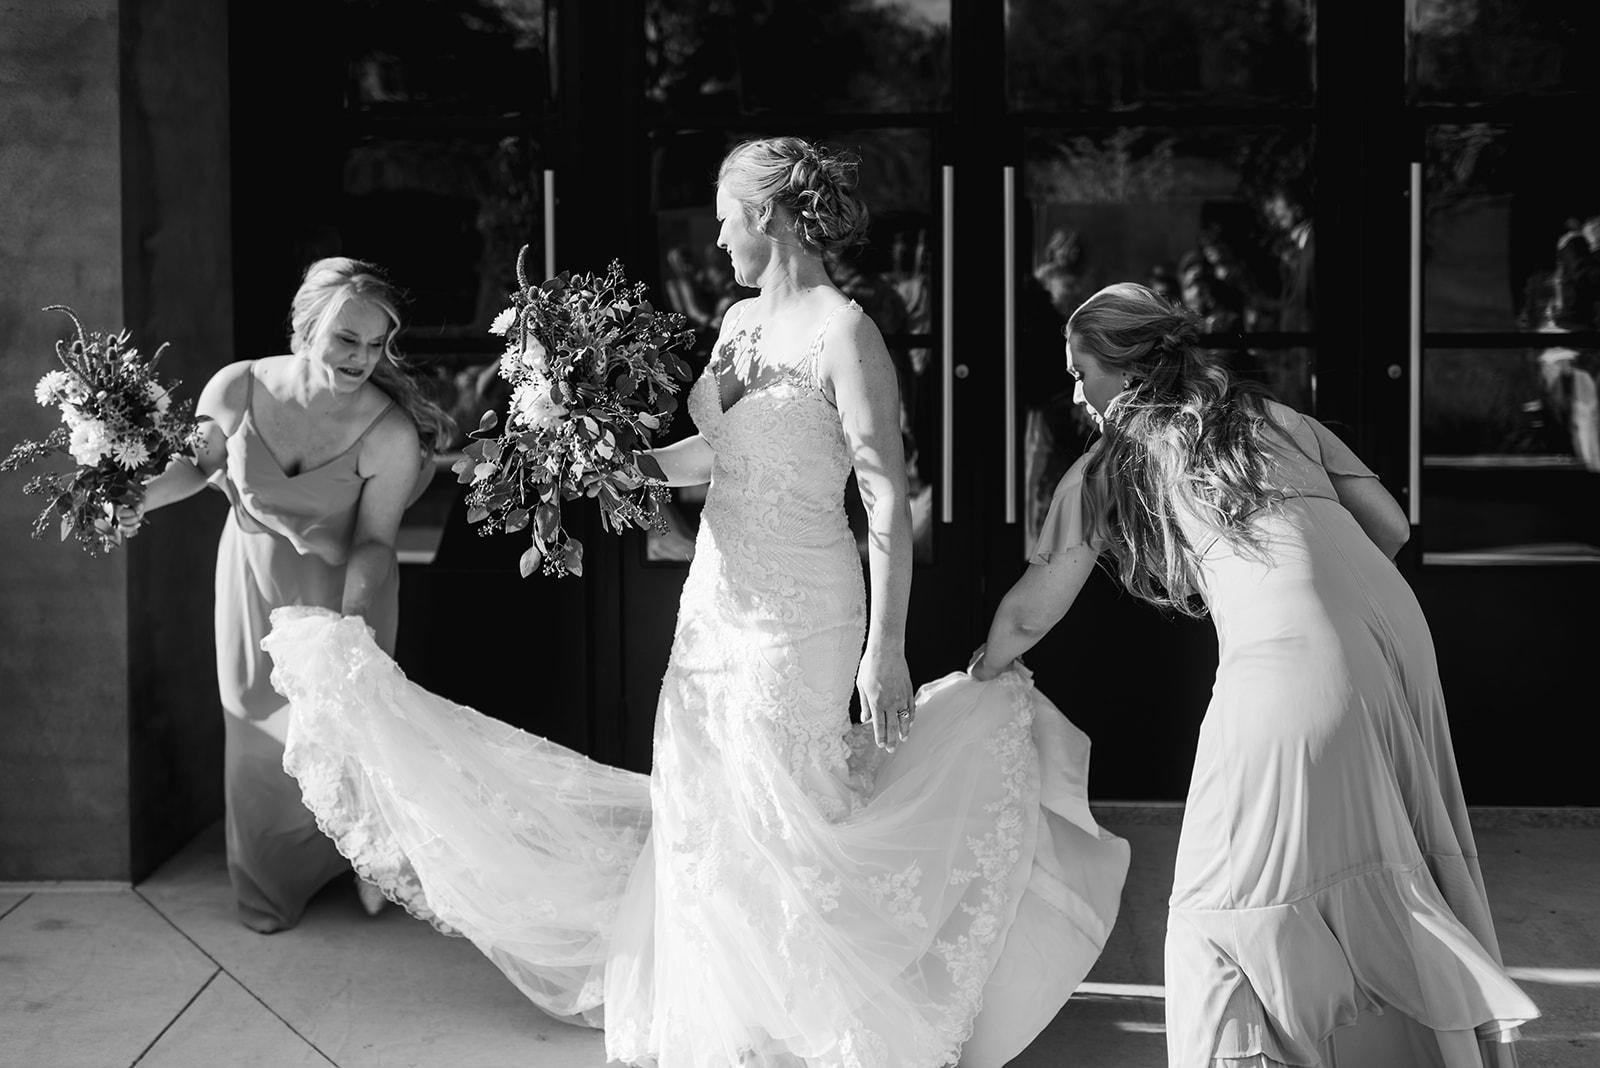 Bridal party photo: Nashville wedding at Clementine featured on Nashville Bride Guide